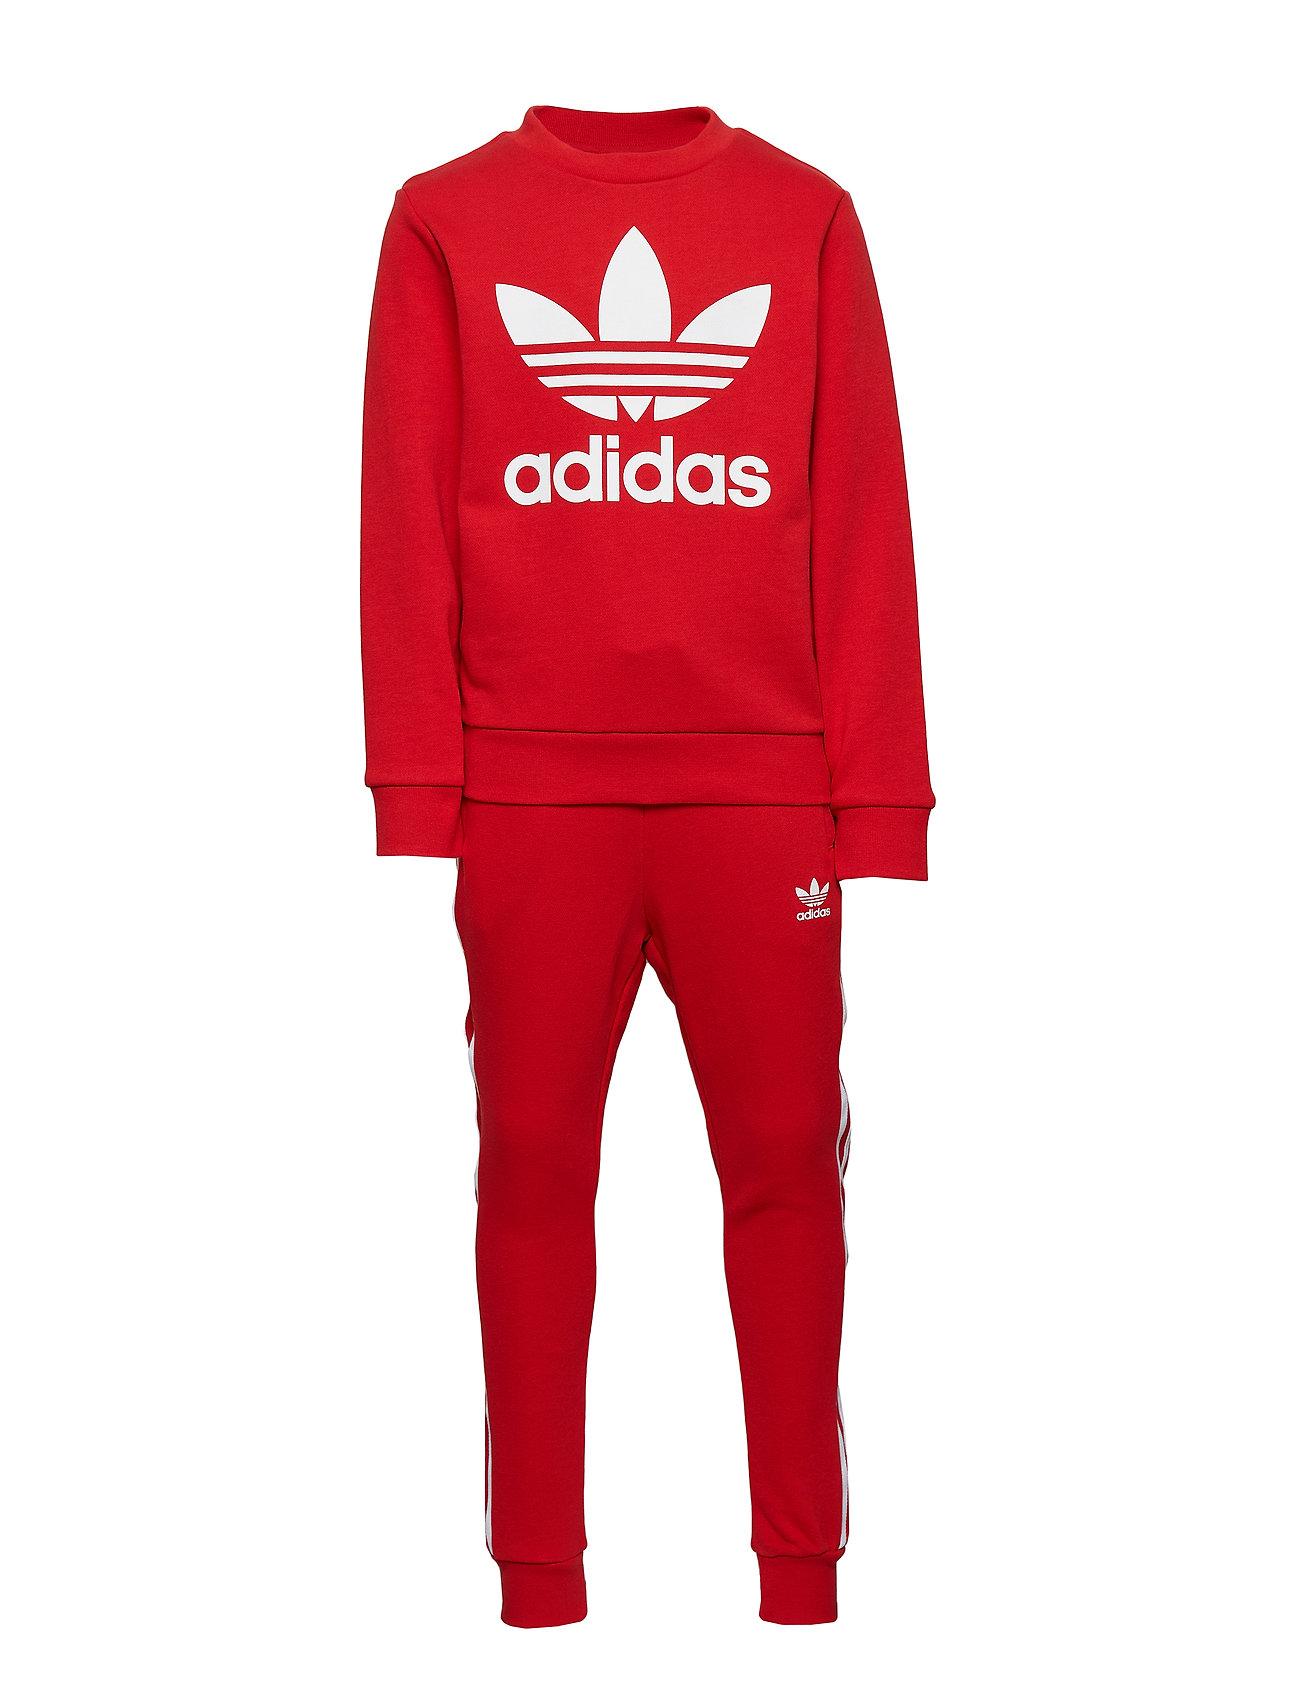 adidas bukser sort rød, Adidas originals longsleeve